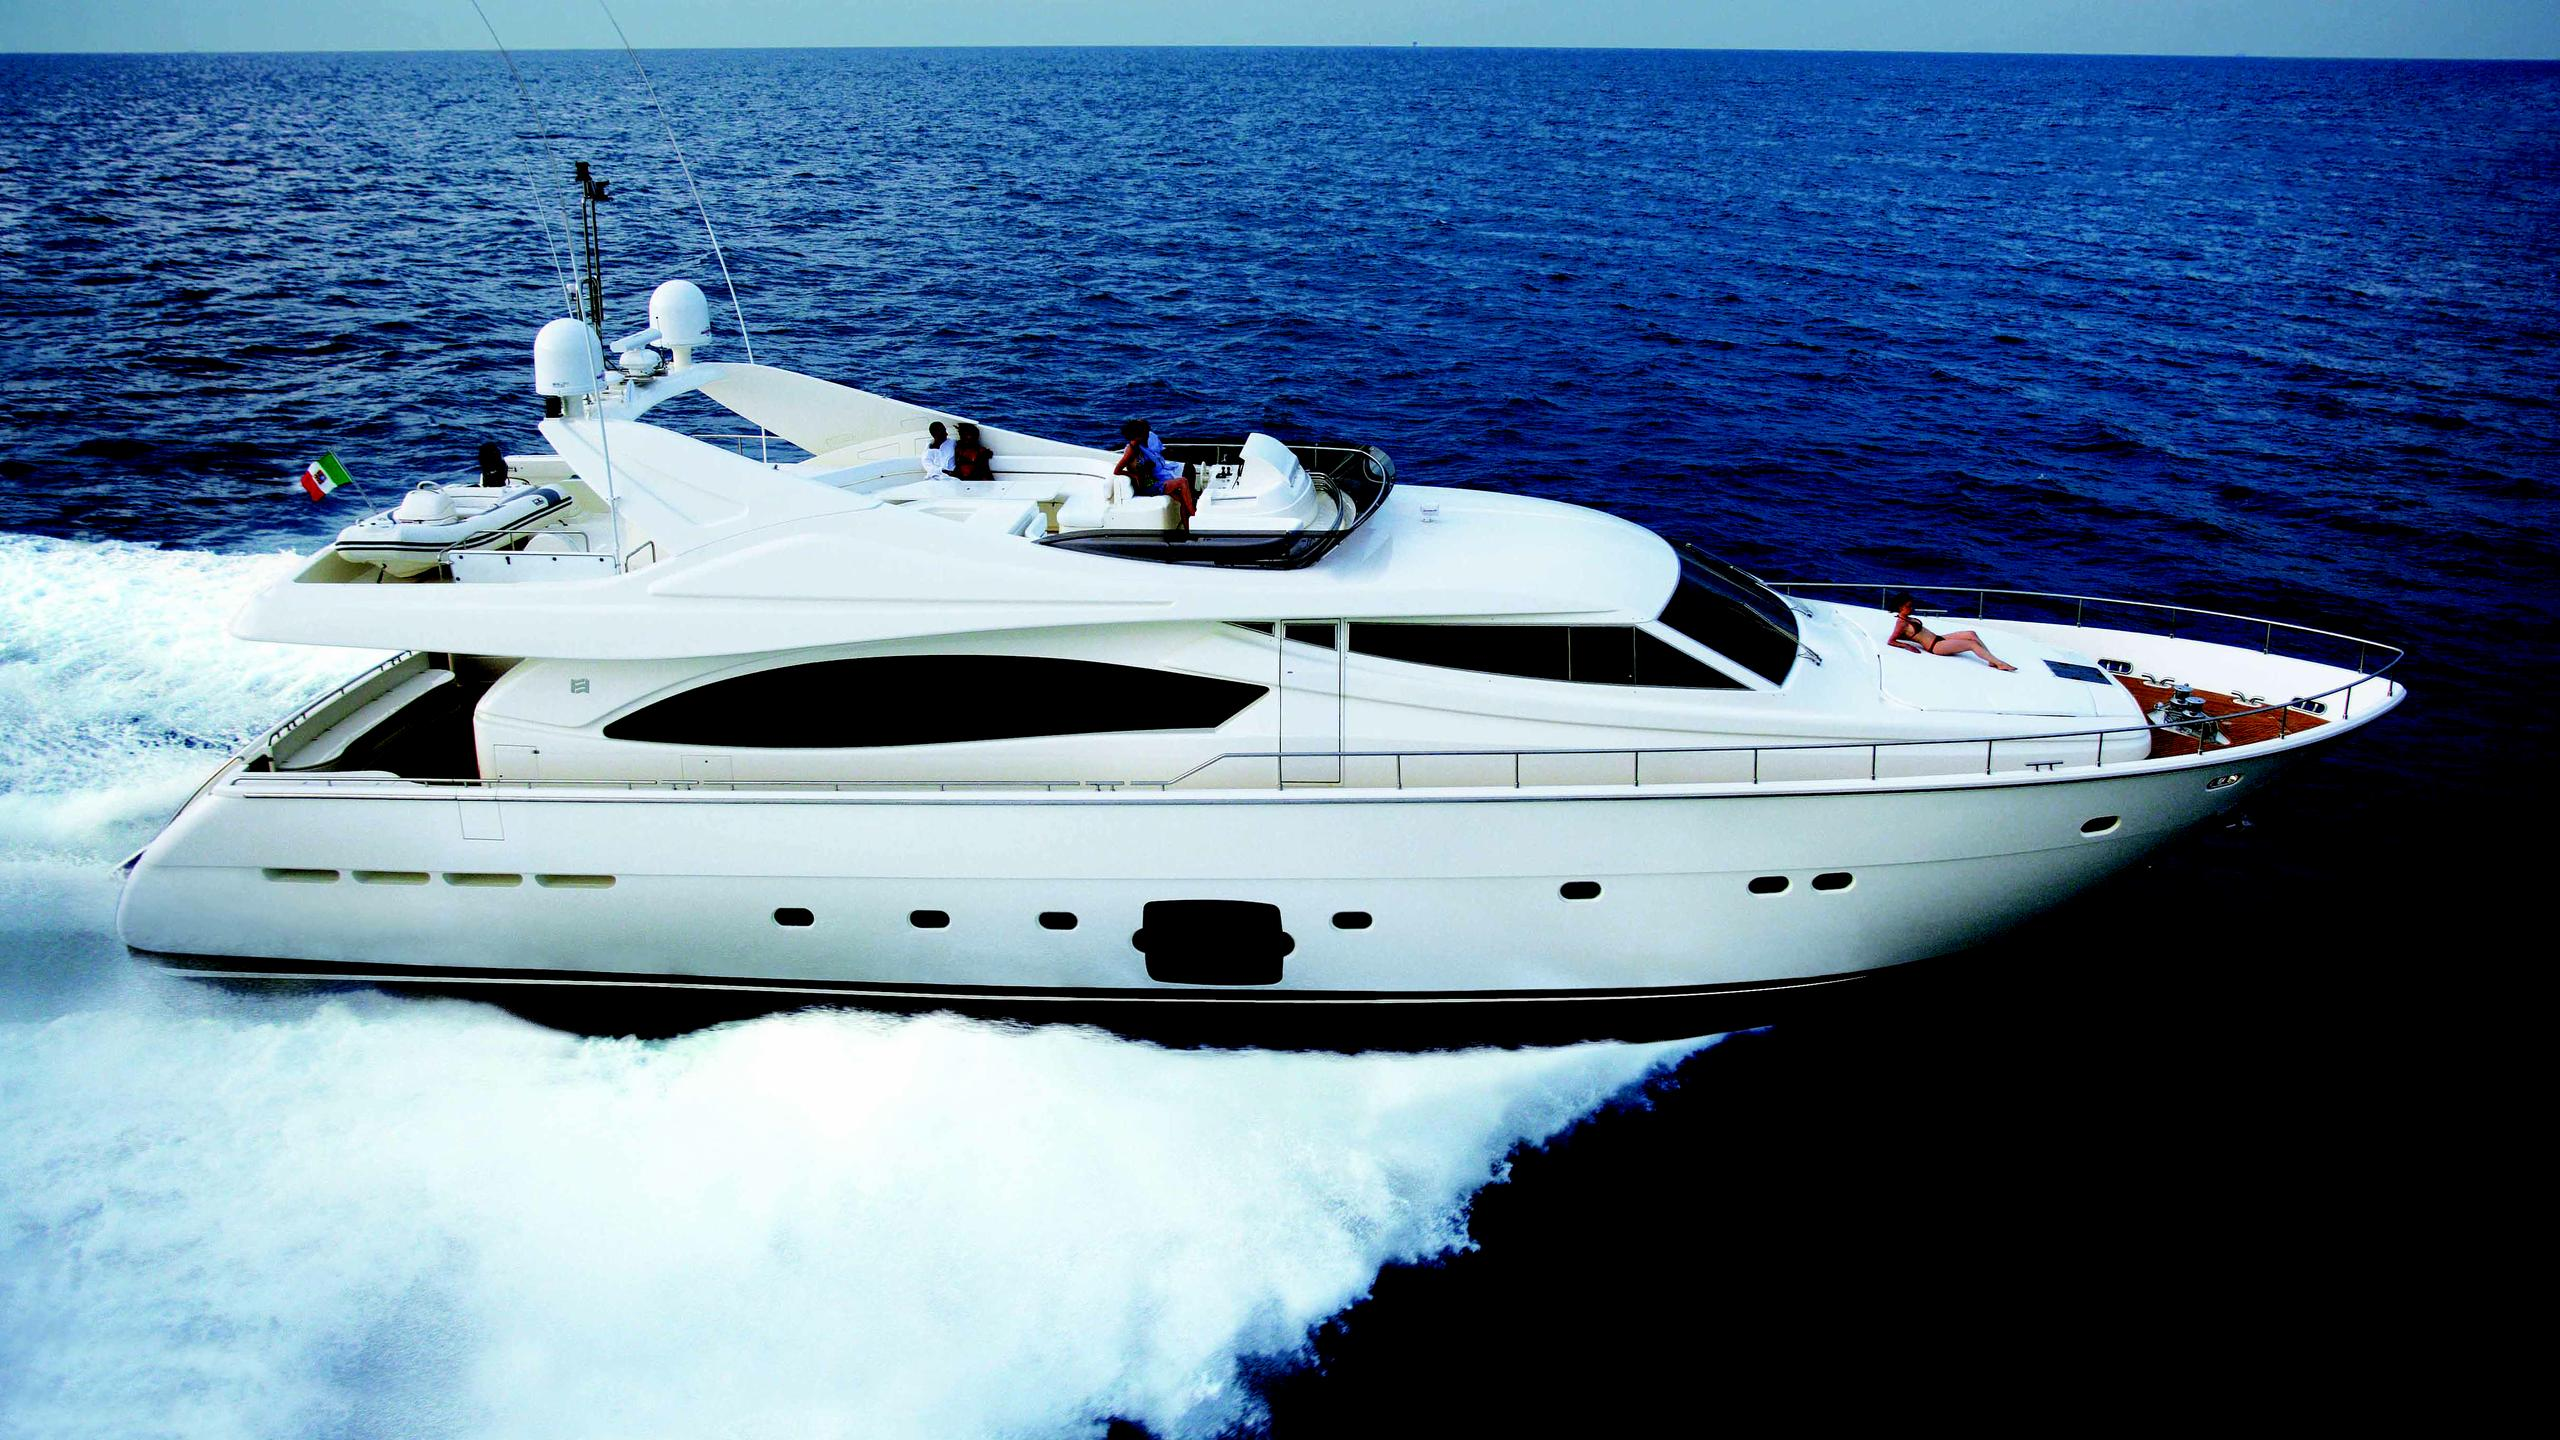 ferretti-881-17-motor-yacht-ferretti-881-2006-27m-cruising